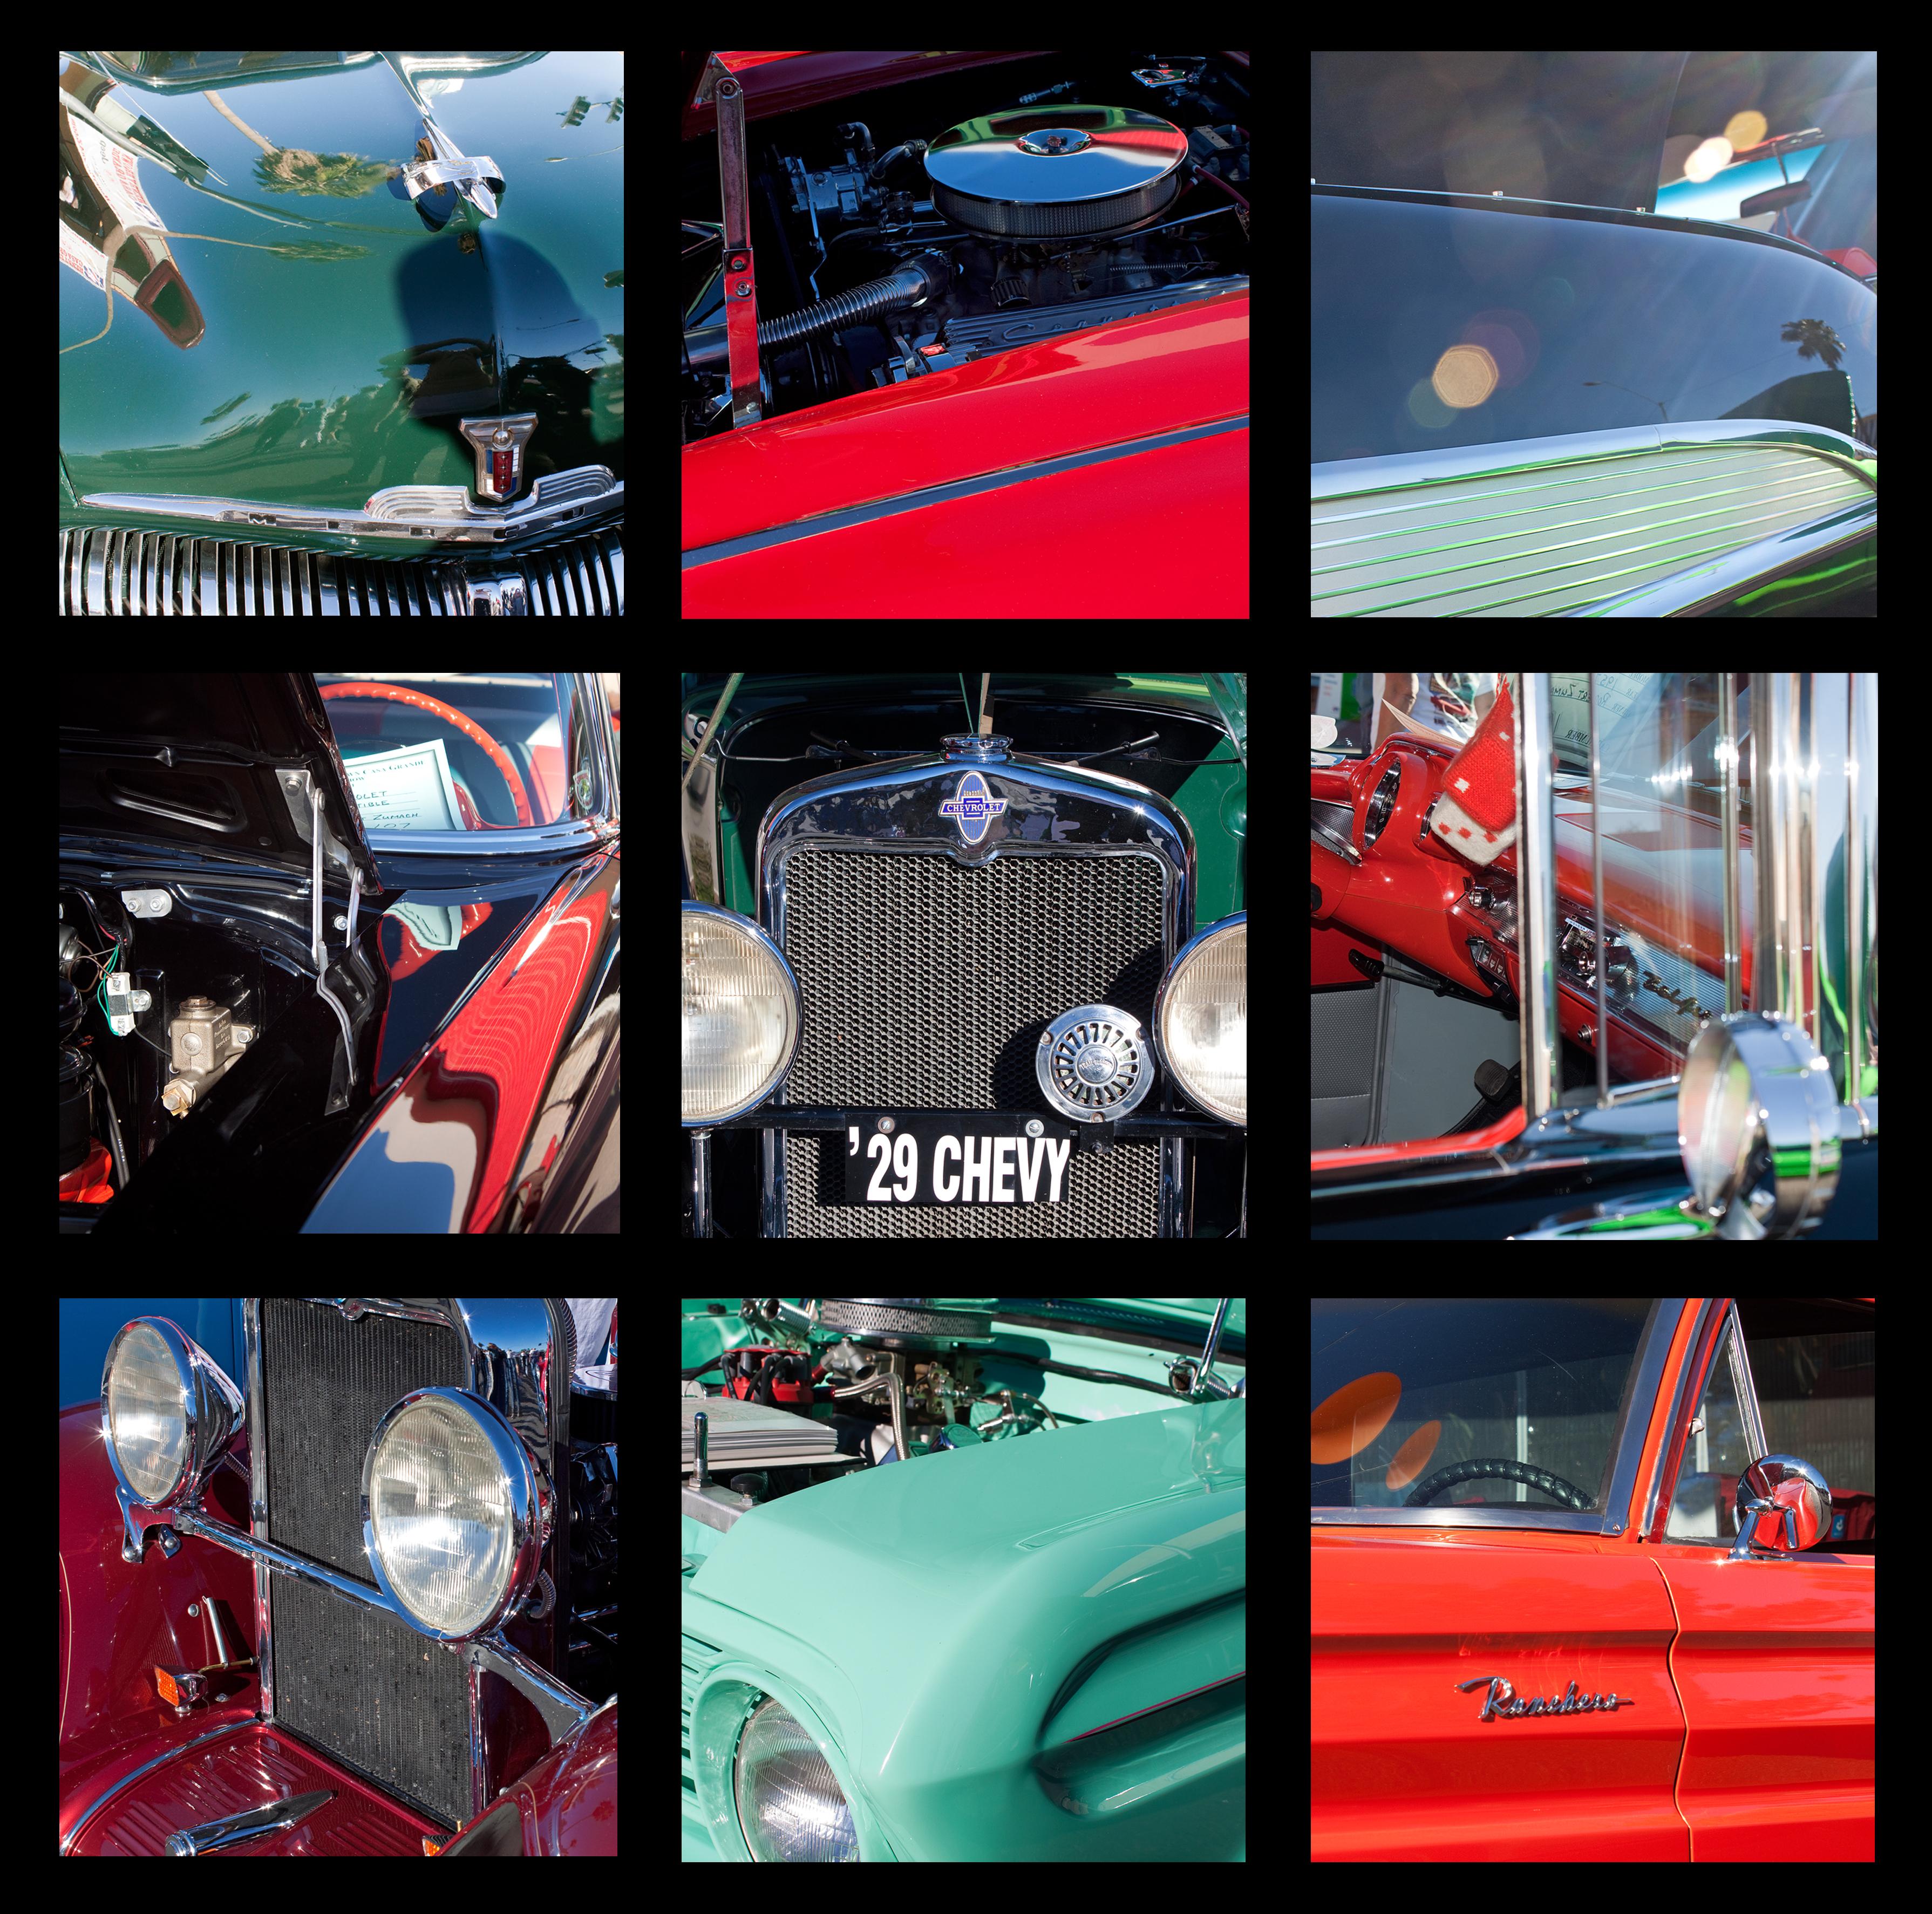 camionetas antiguas chevrolet opala tuning